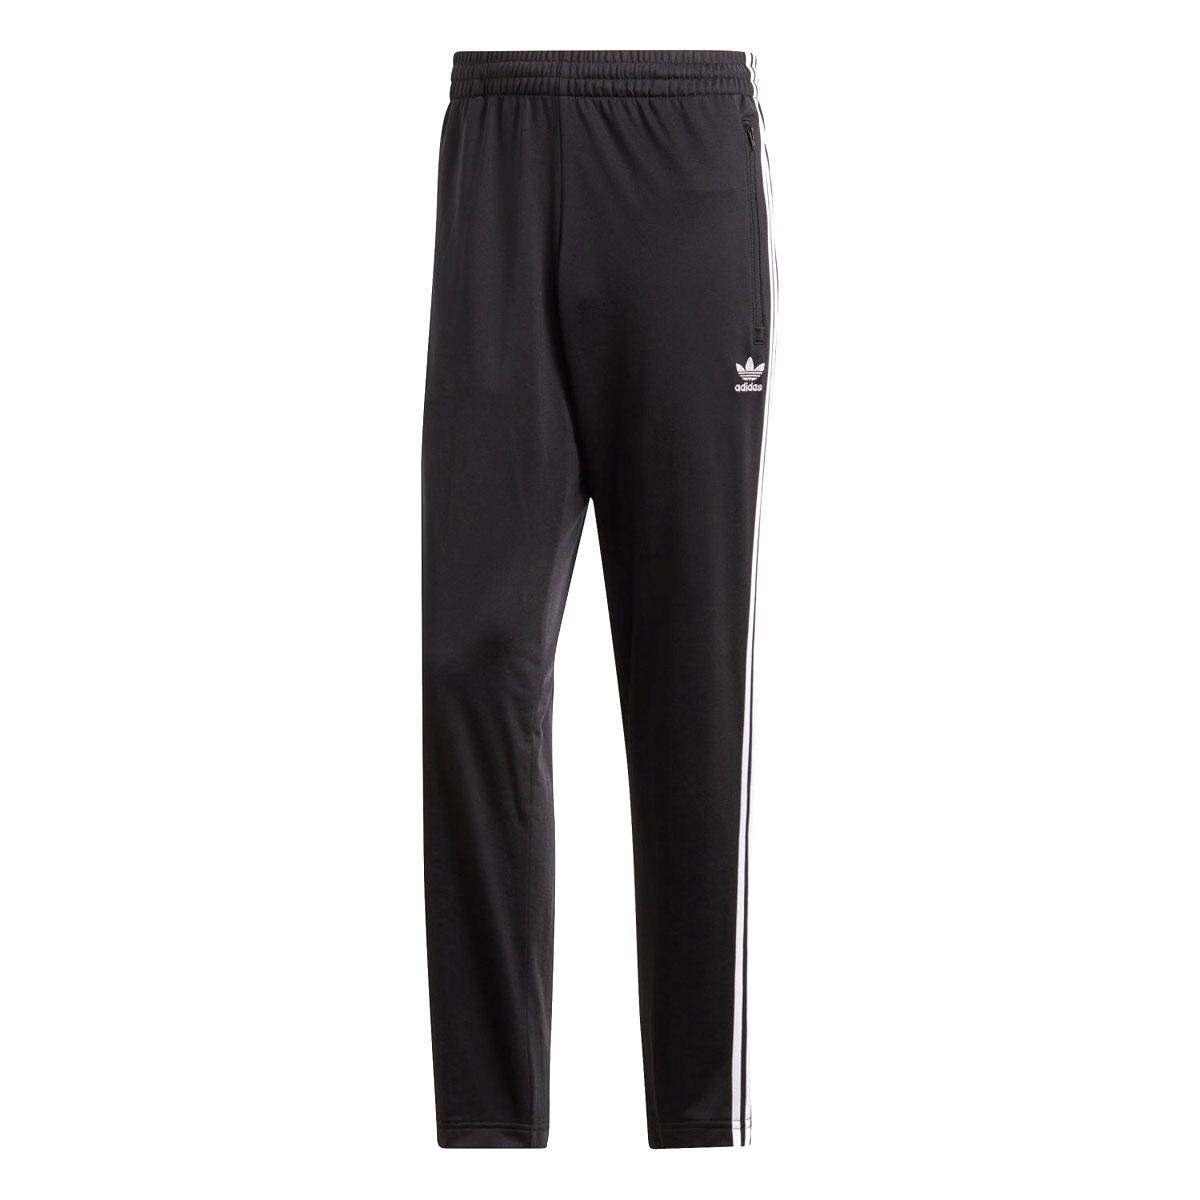 adidas Originals FIREBIRD TRACK PANTS(BLACK)(アディダスオリジナルス ファイアーバード トラック パンツ)【メンズ】【パンツ】【19SS-I】